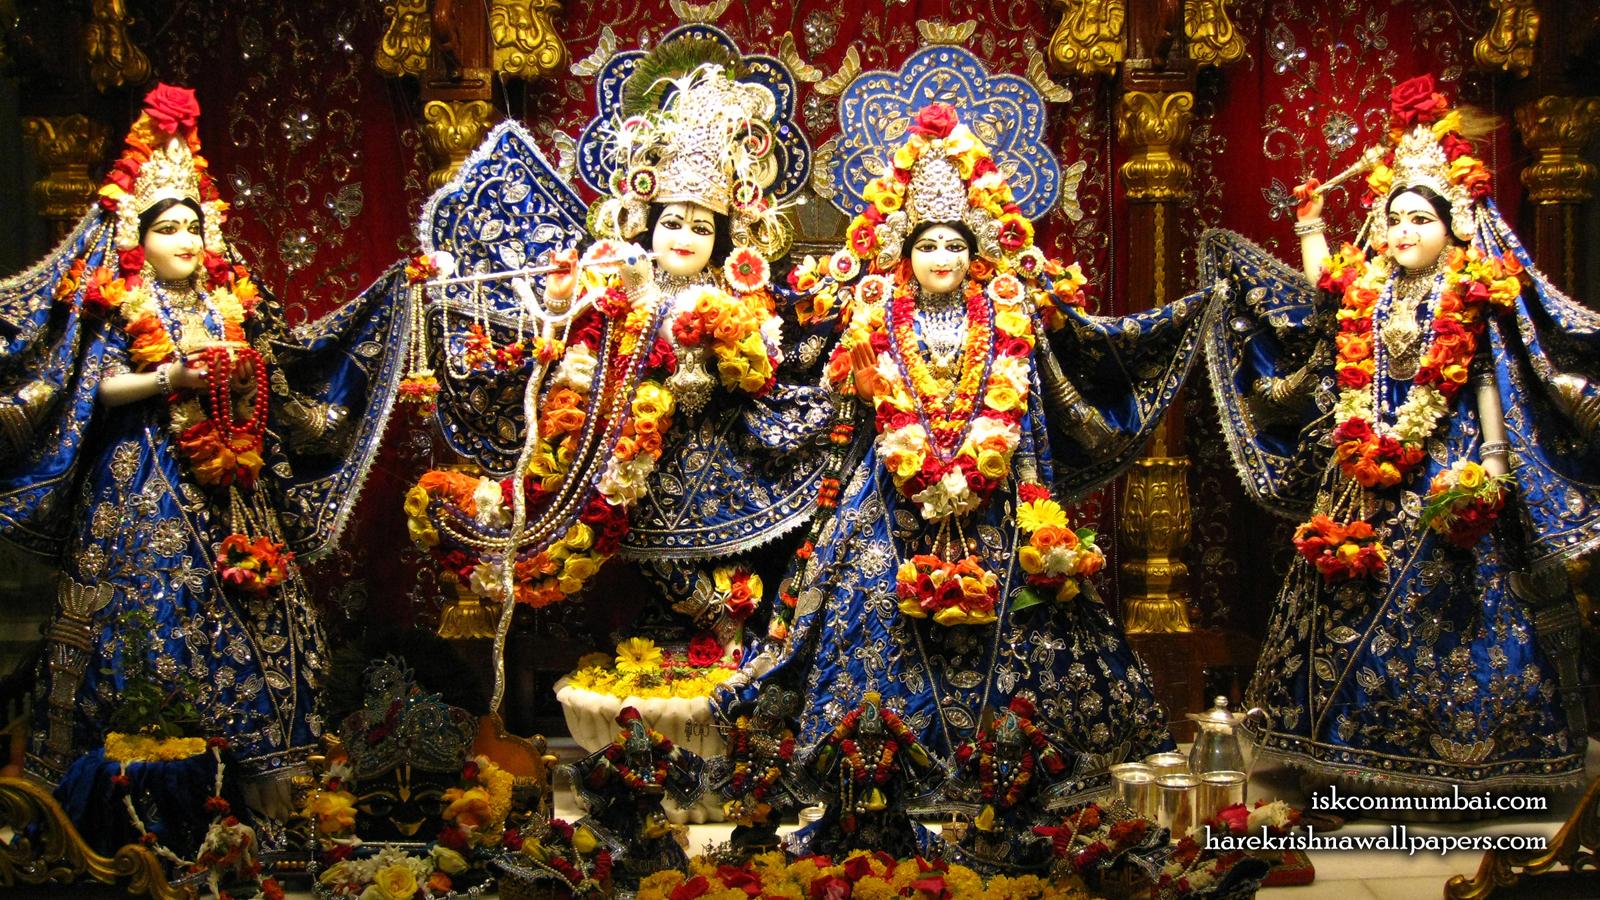 Sri Sri Radha Rasabihari Lalita Vishakha Wallpaper (010) Size 1600x900 Download